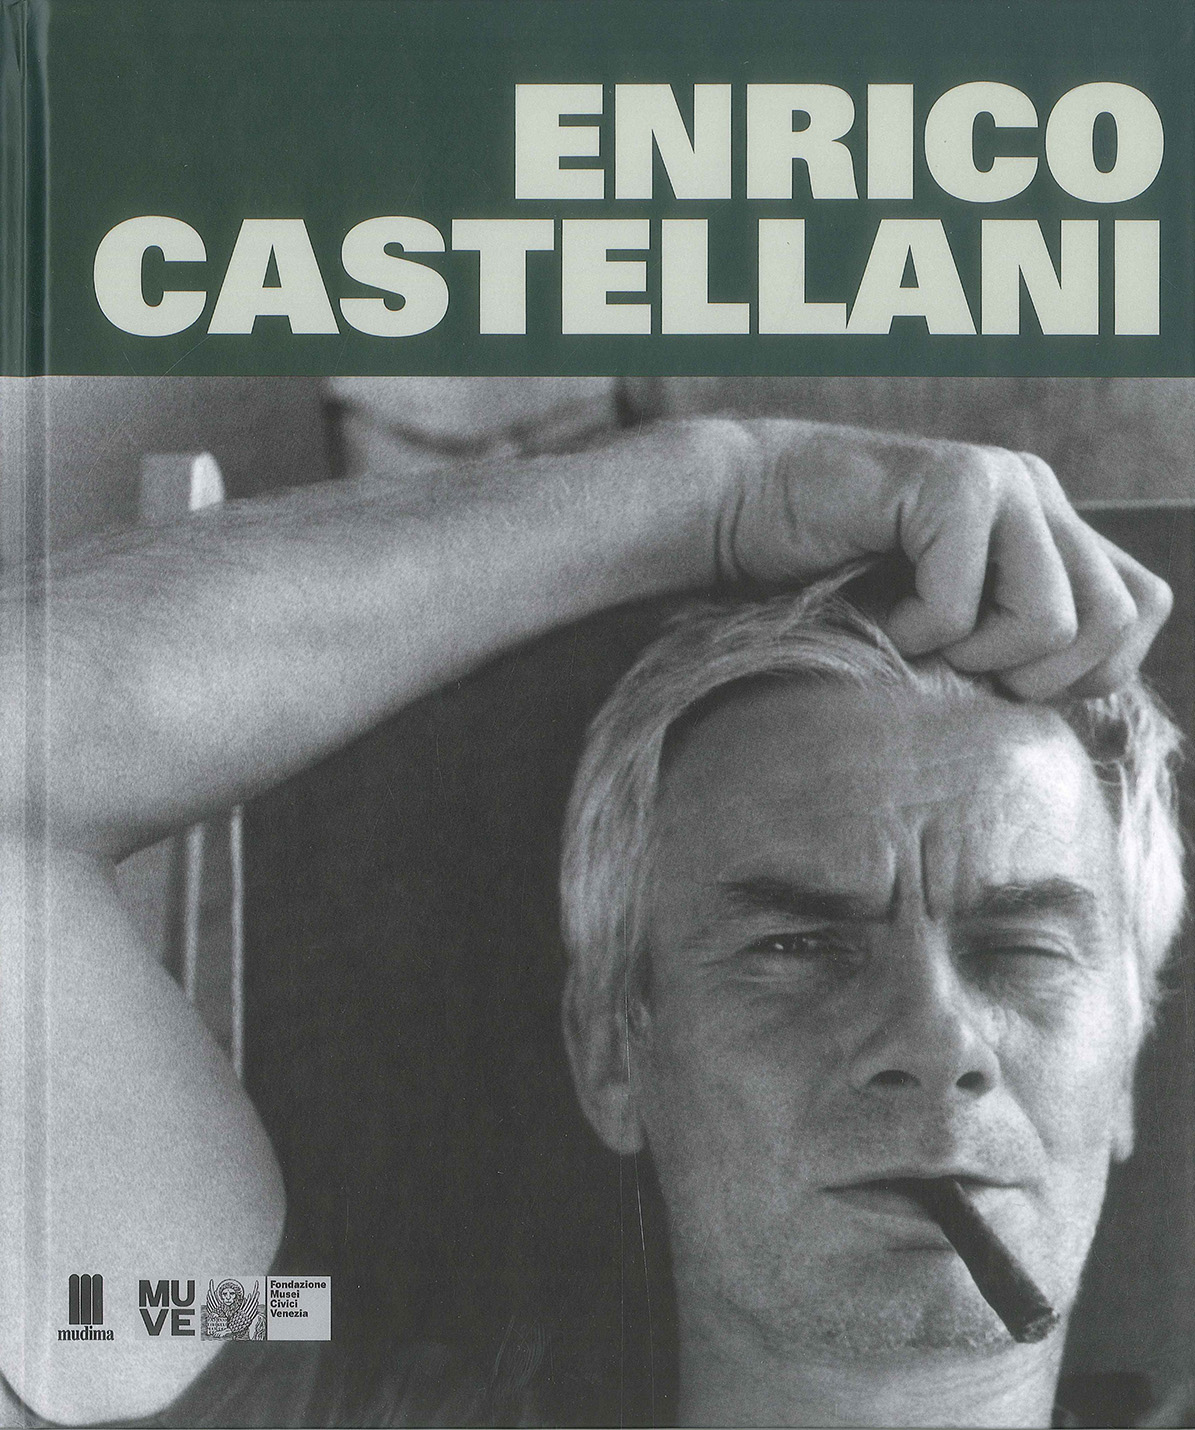 Cover - Enrico Castellani, Davide Di Maggio, Lóránd Hegyi, 2013, Ca' Pesaro. Galleria Internazionale d'Arte Moderna, Venezia